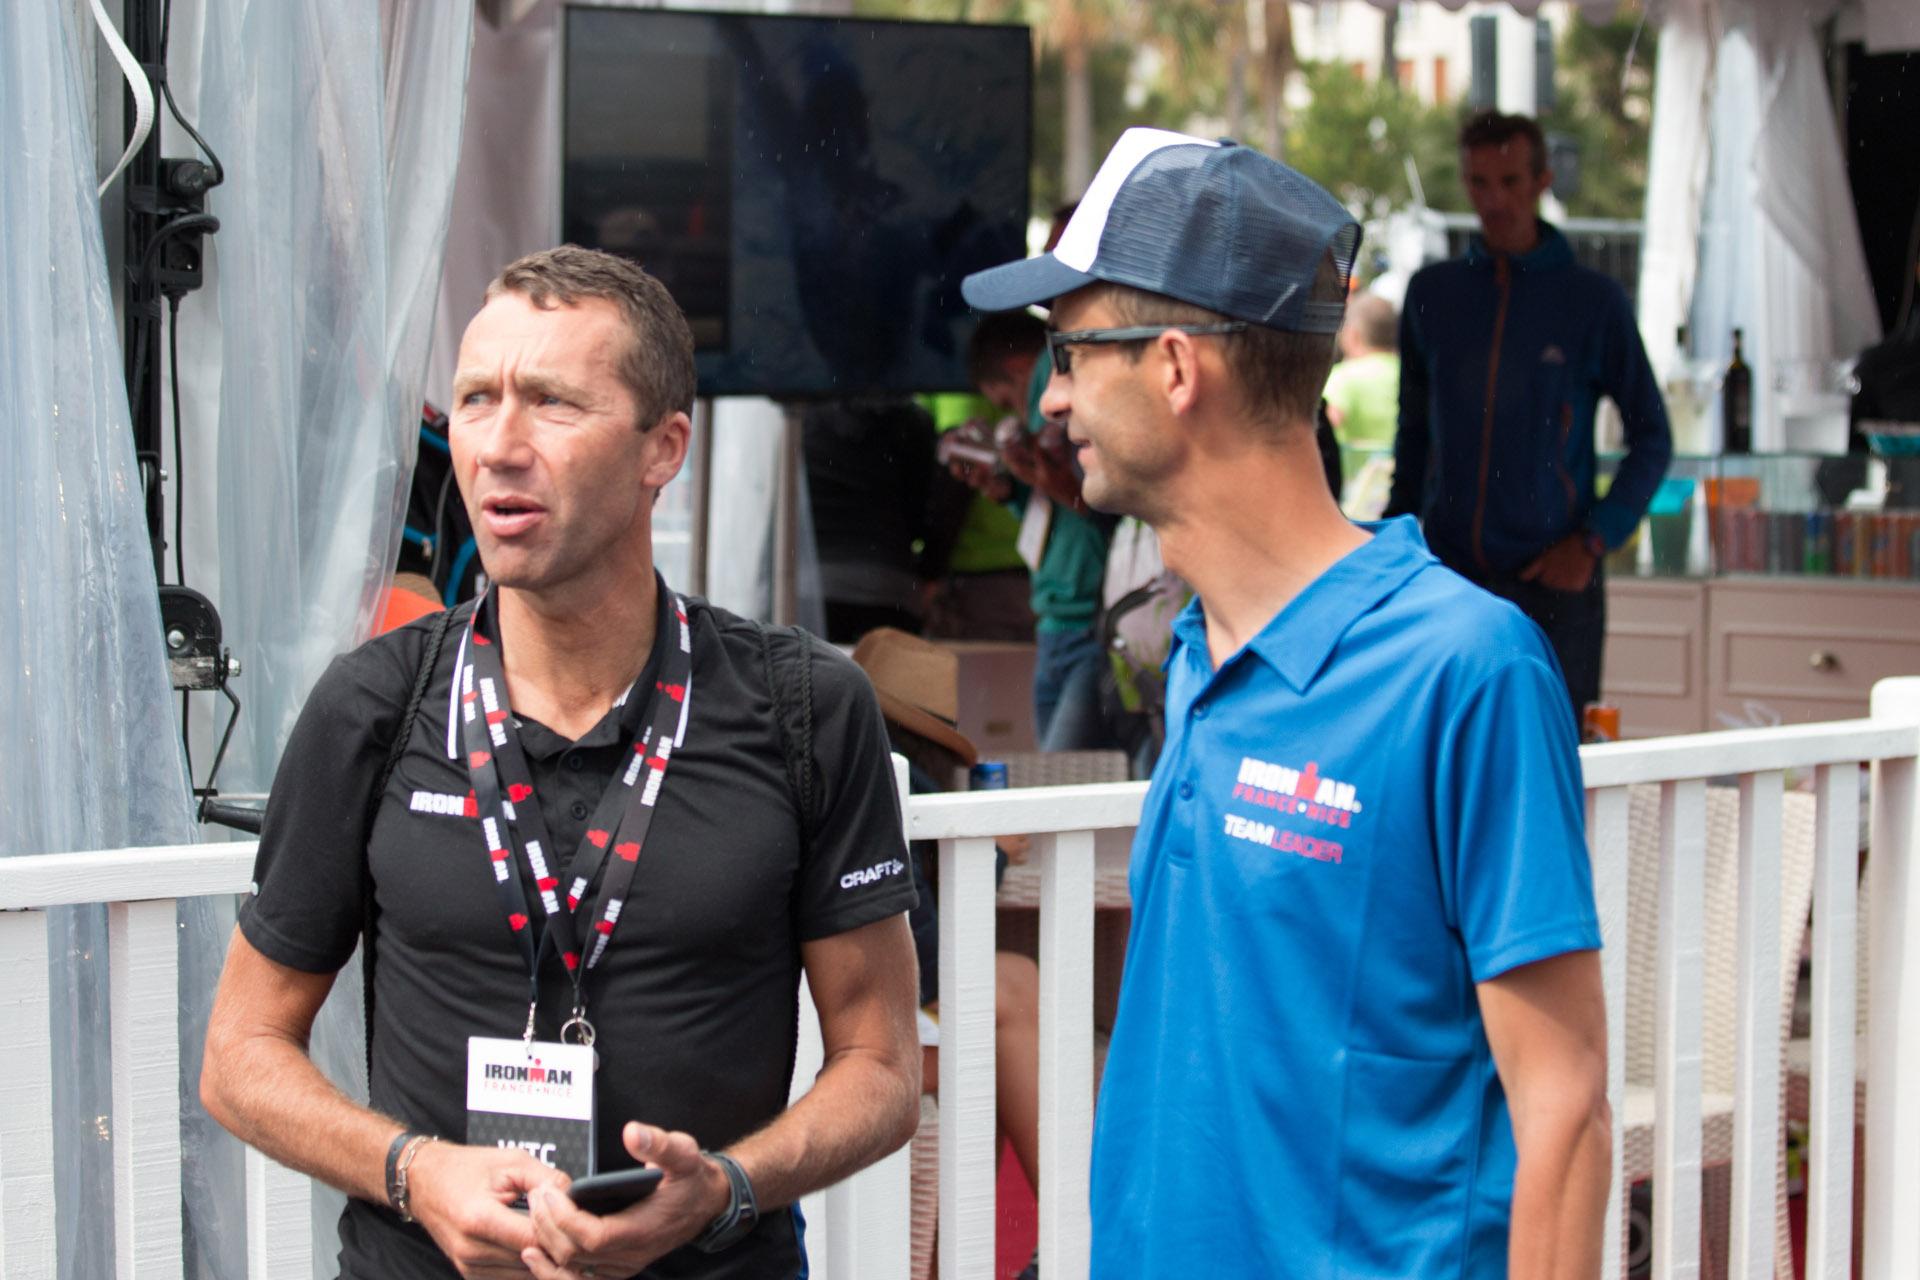 Yves Cordier pendant l'Ironman de Nice